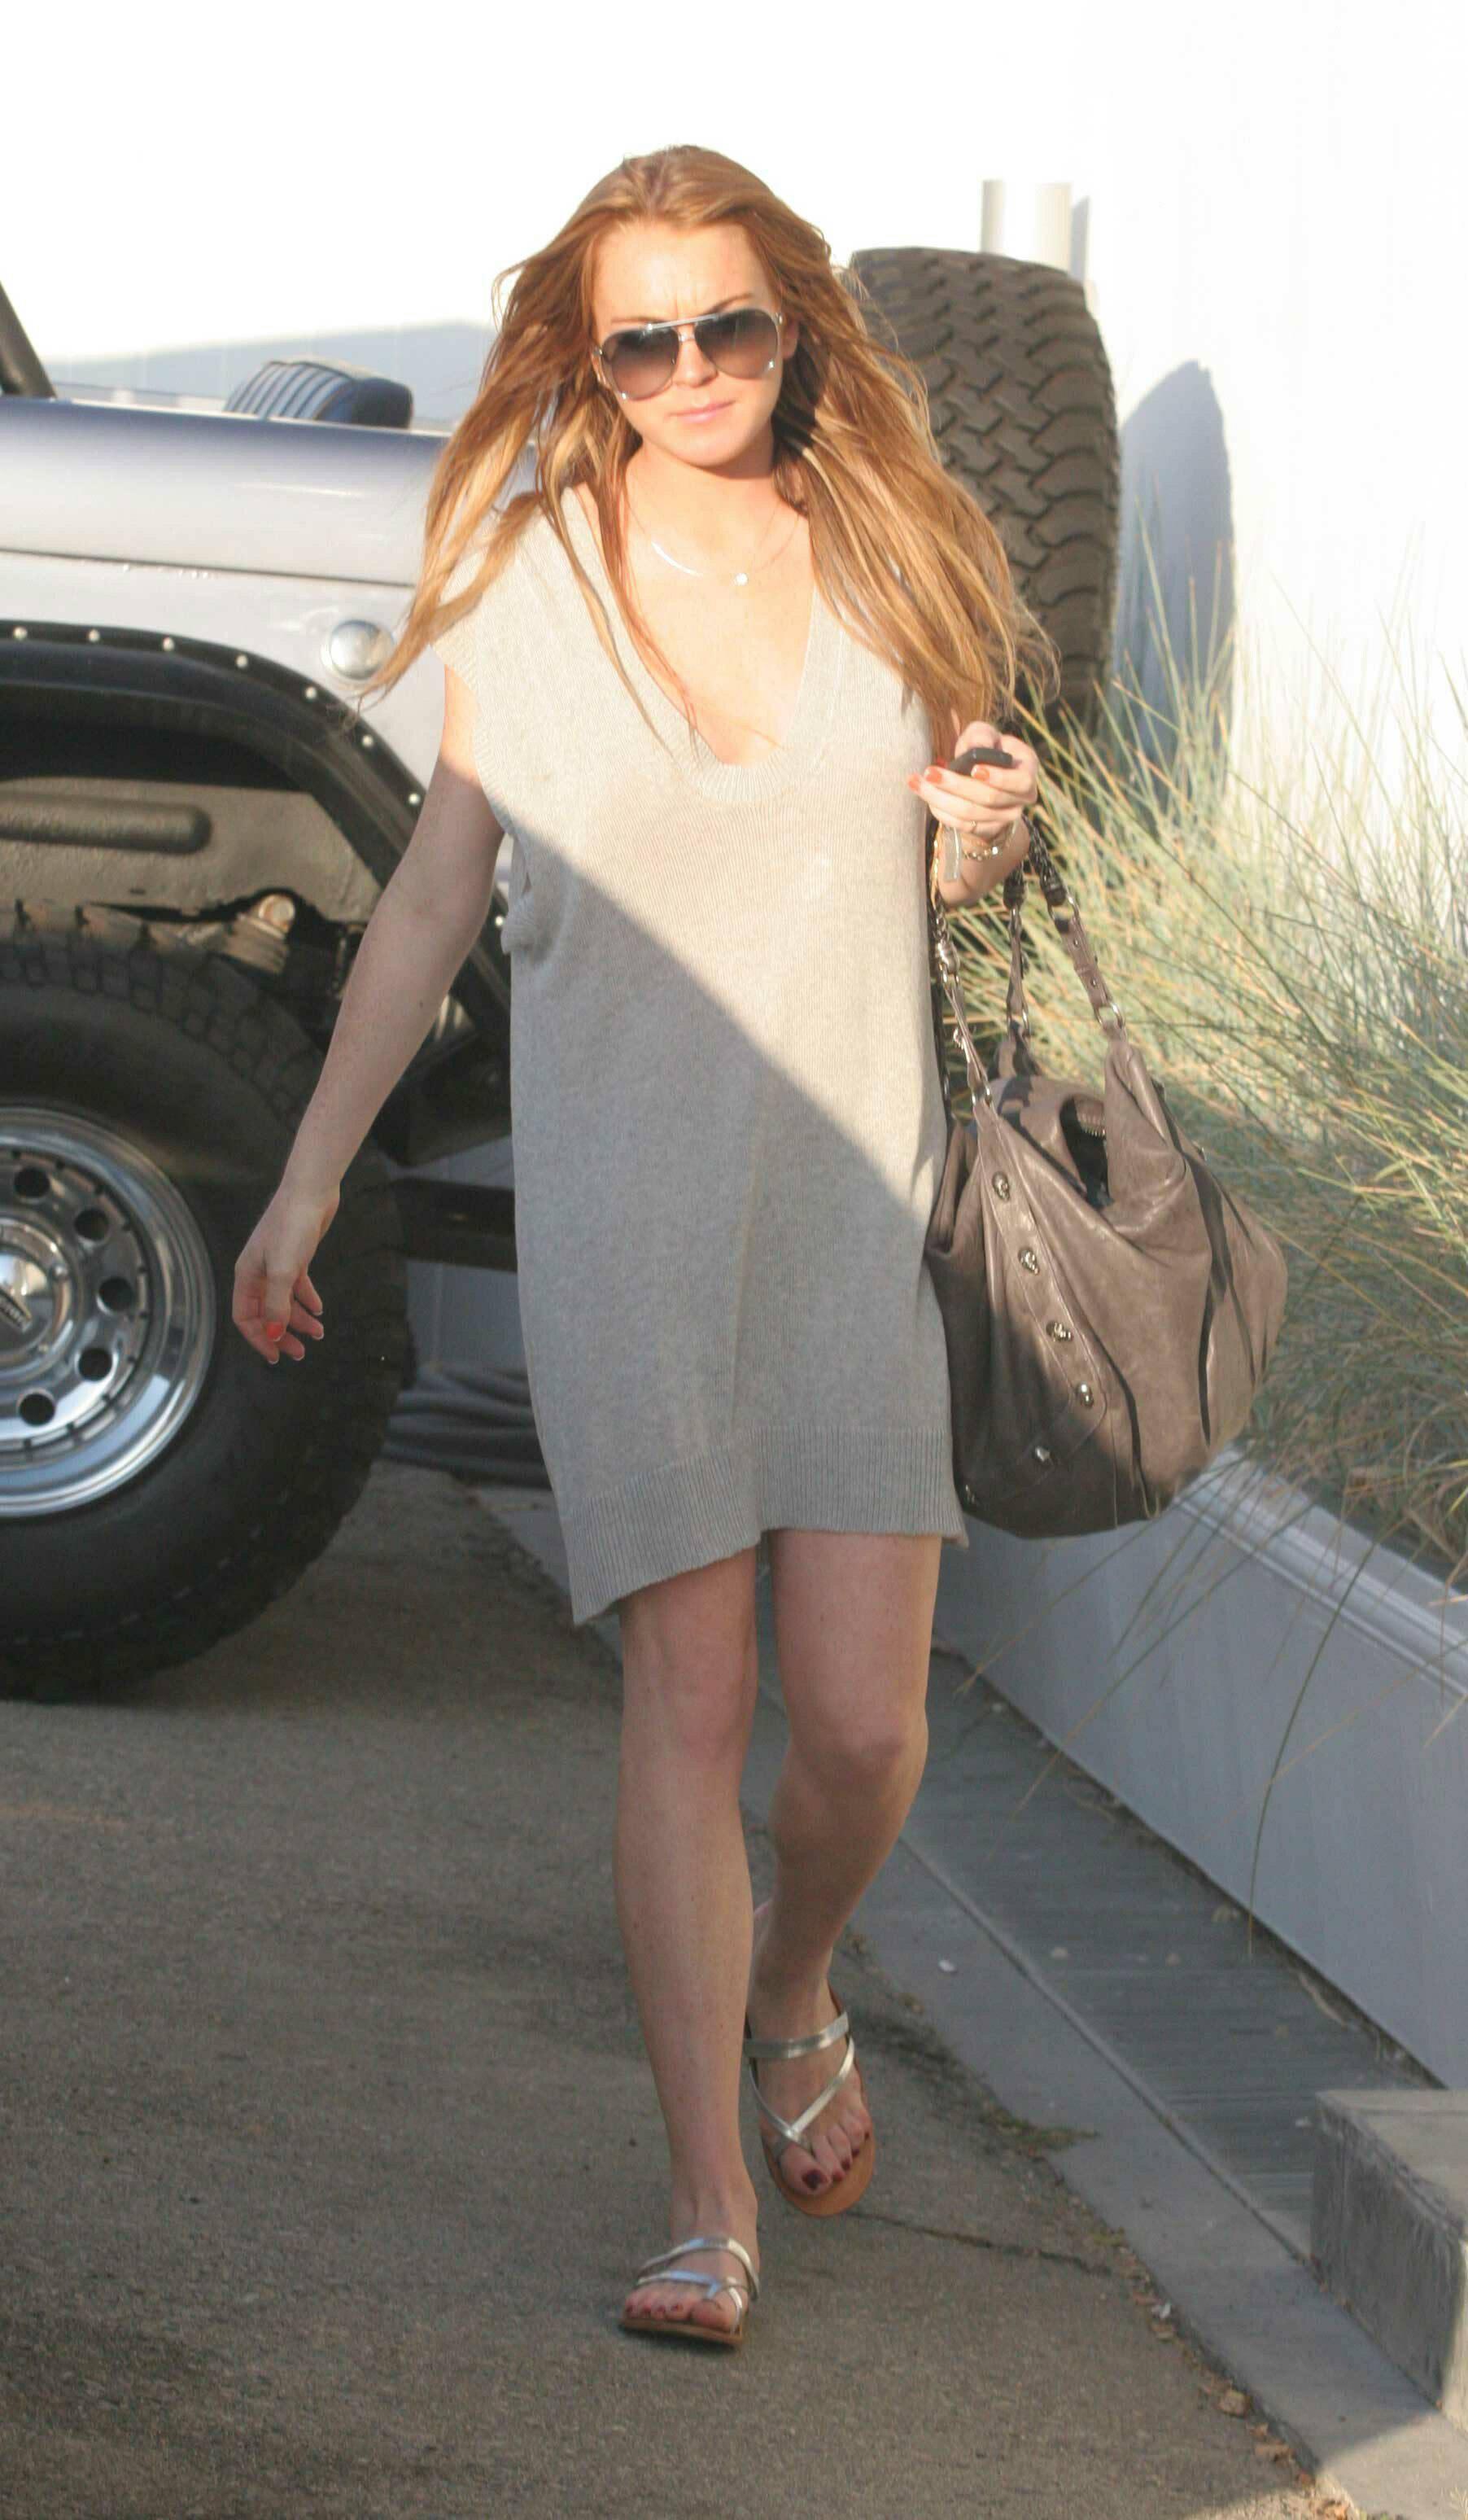 99975_3564925_Lindsay_Lohan_flashes_a_bit_too_much_skin_while_ou3564925_Lindsay_Lohan_flashes_a_bi_122_399lo.jpg